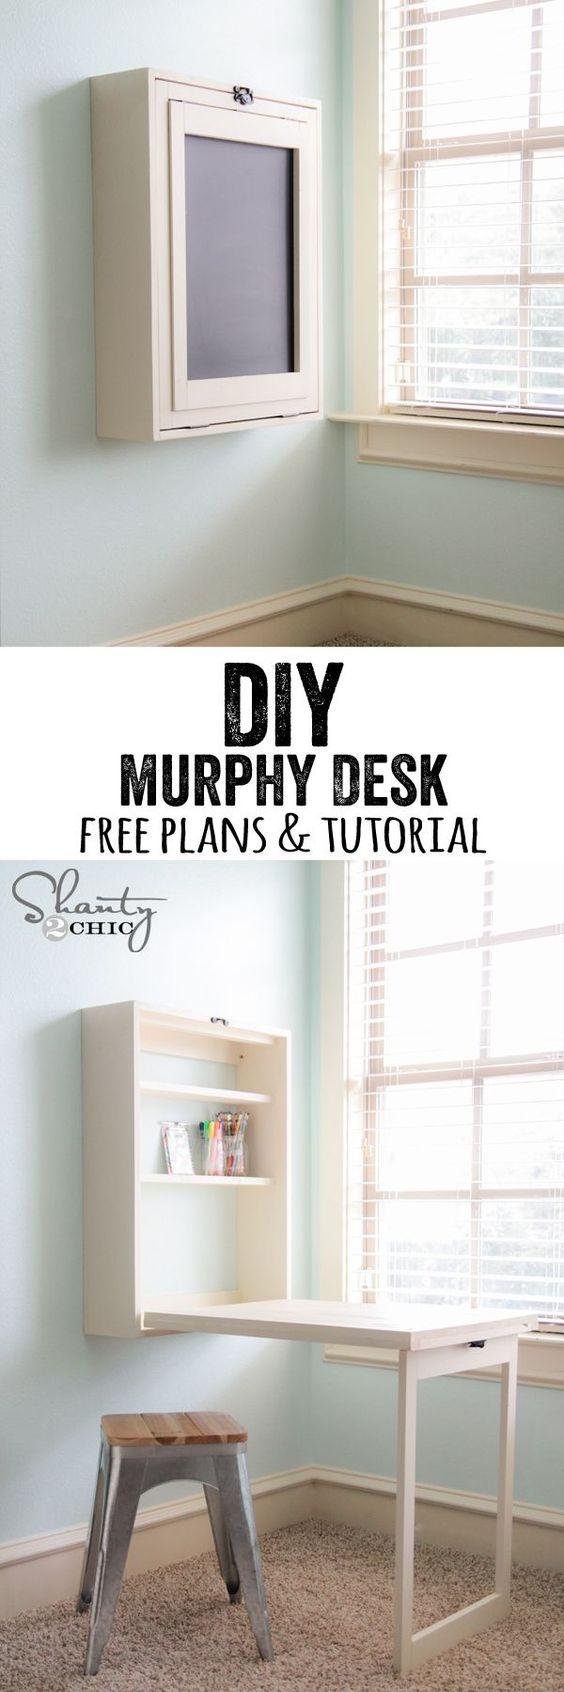 DIY desk tutorial. How To Make a Murphy Desk | Organization and DIY Storage Ideas | Tiny Homes